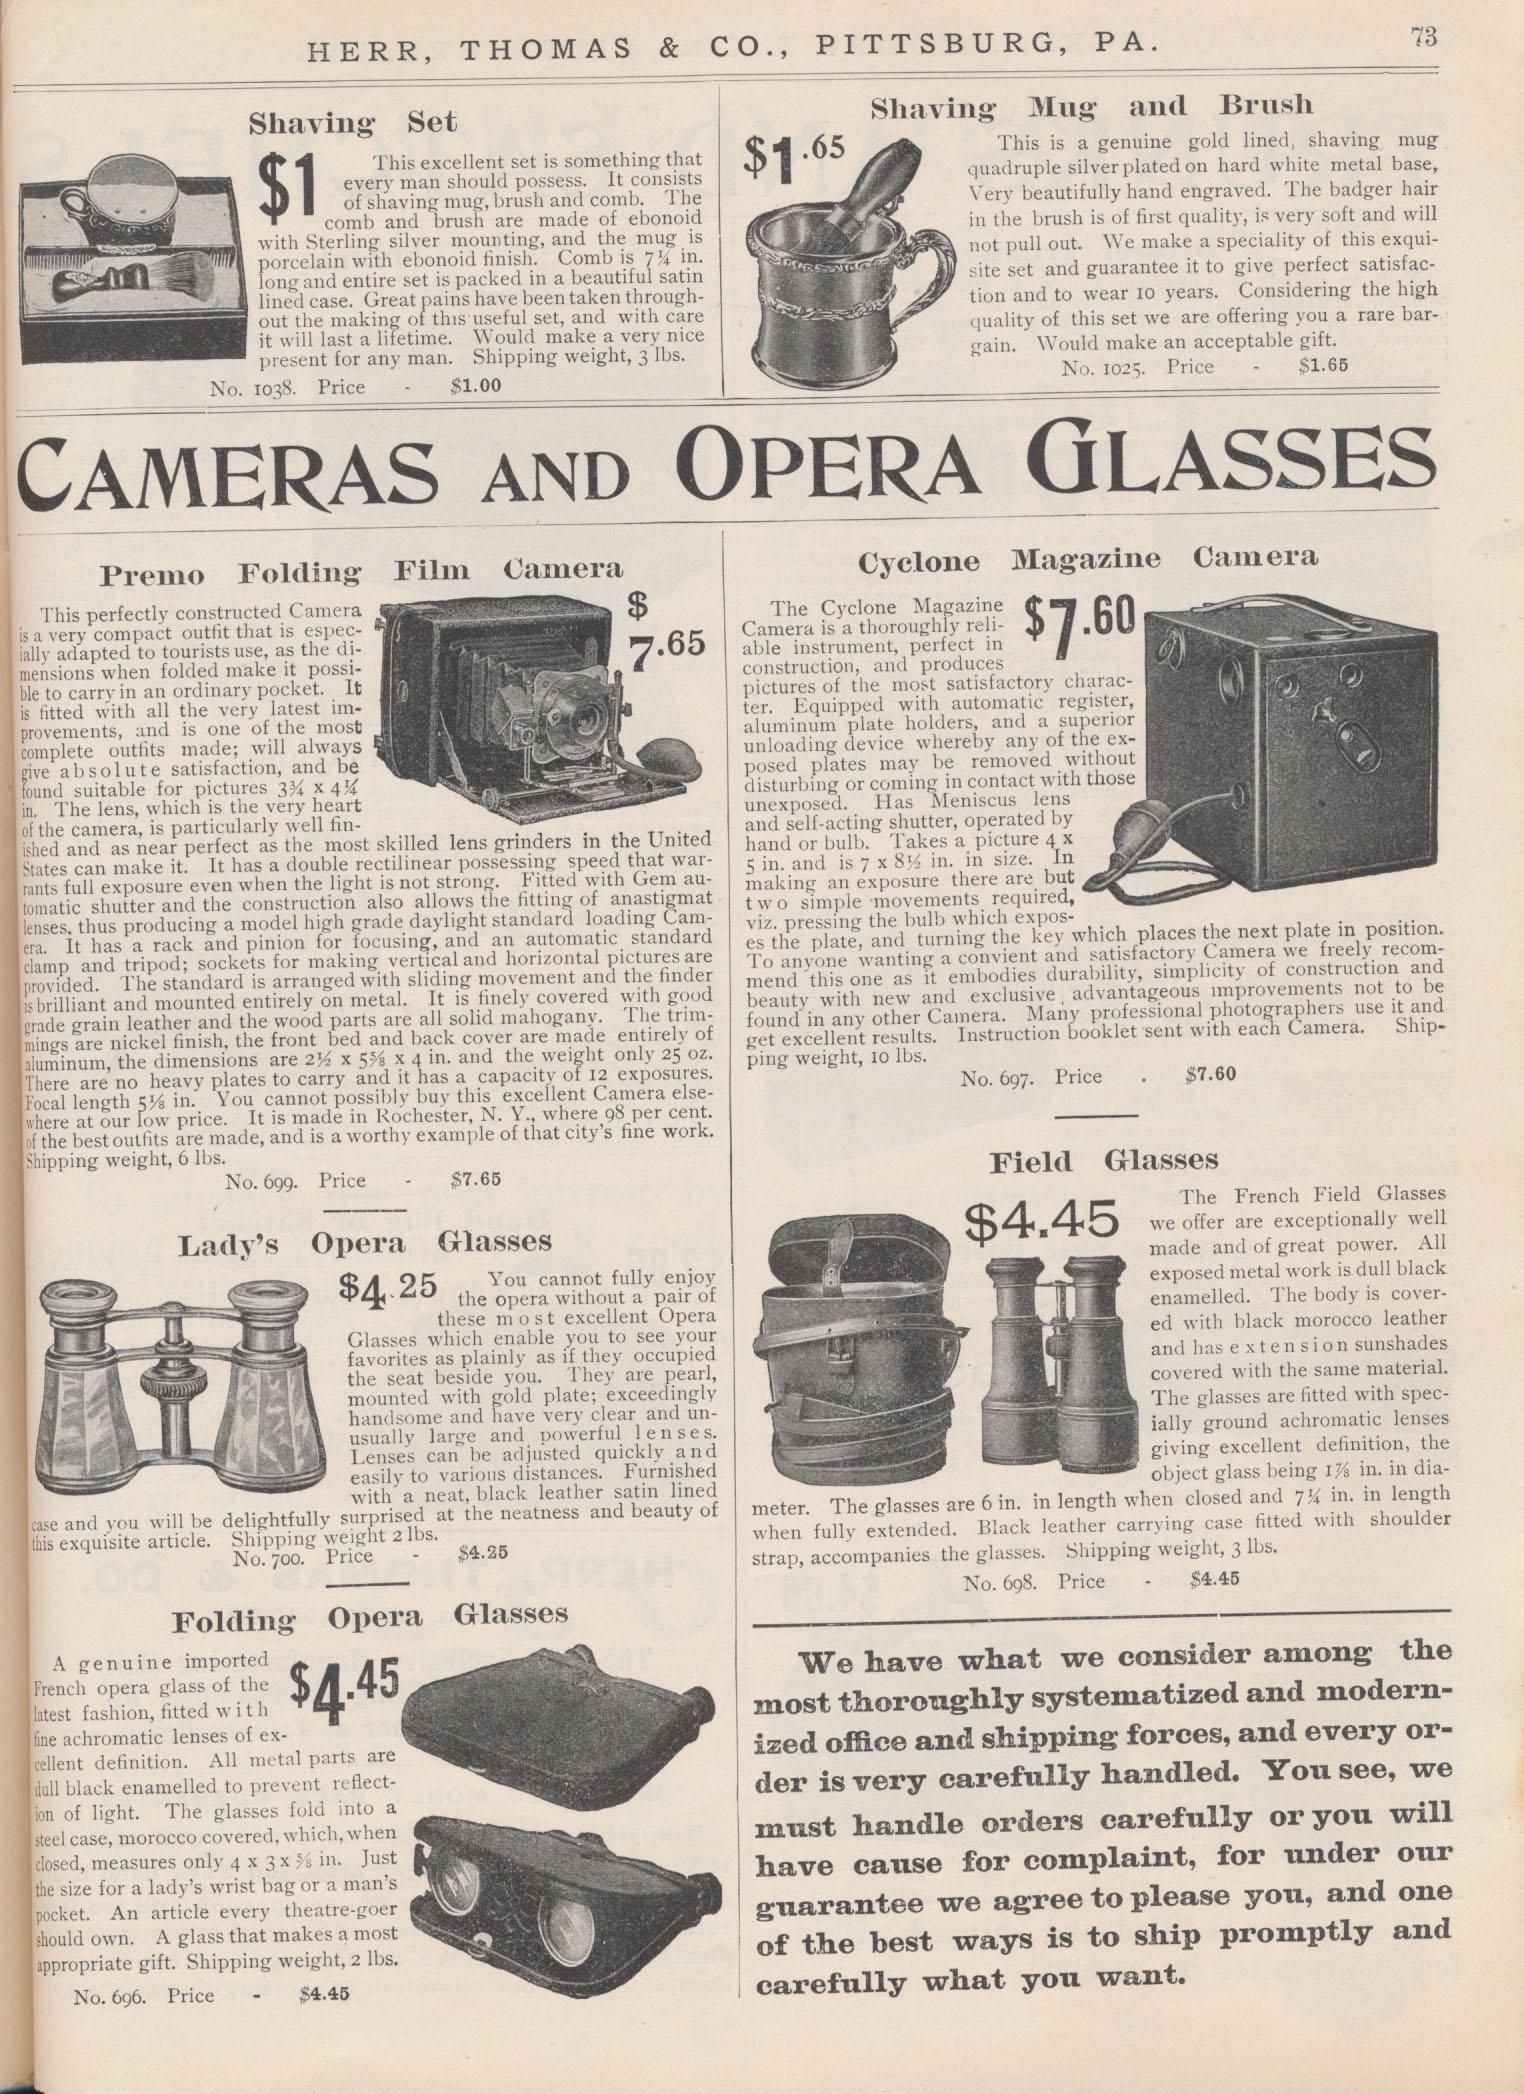 Shaving Set, Shaving Mug and Brush, Premo Folding Film Camera, Cyclone Magazine Camera, Lady's Opera Glasses, Folding Opera Glasses, Field Glasses